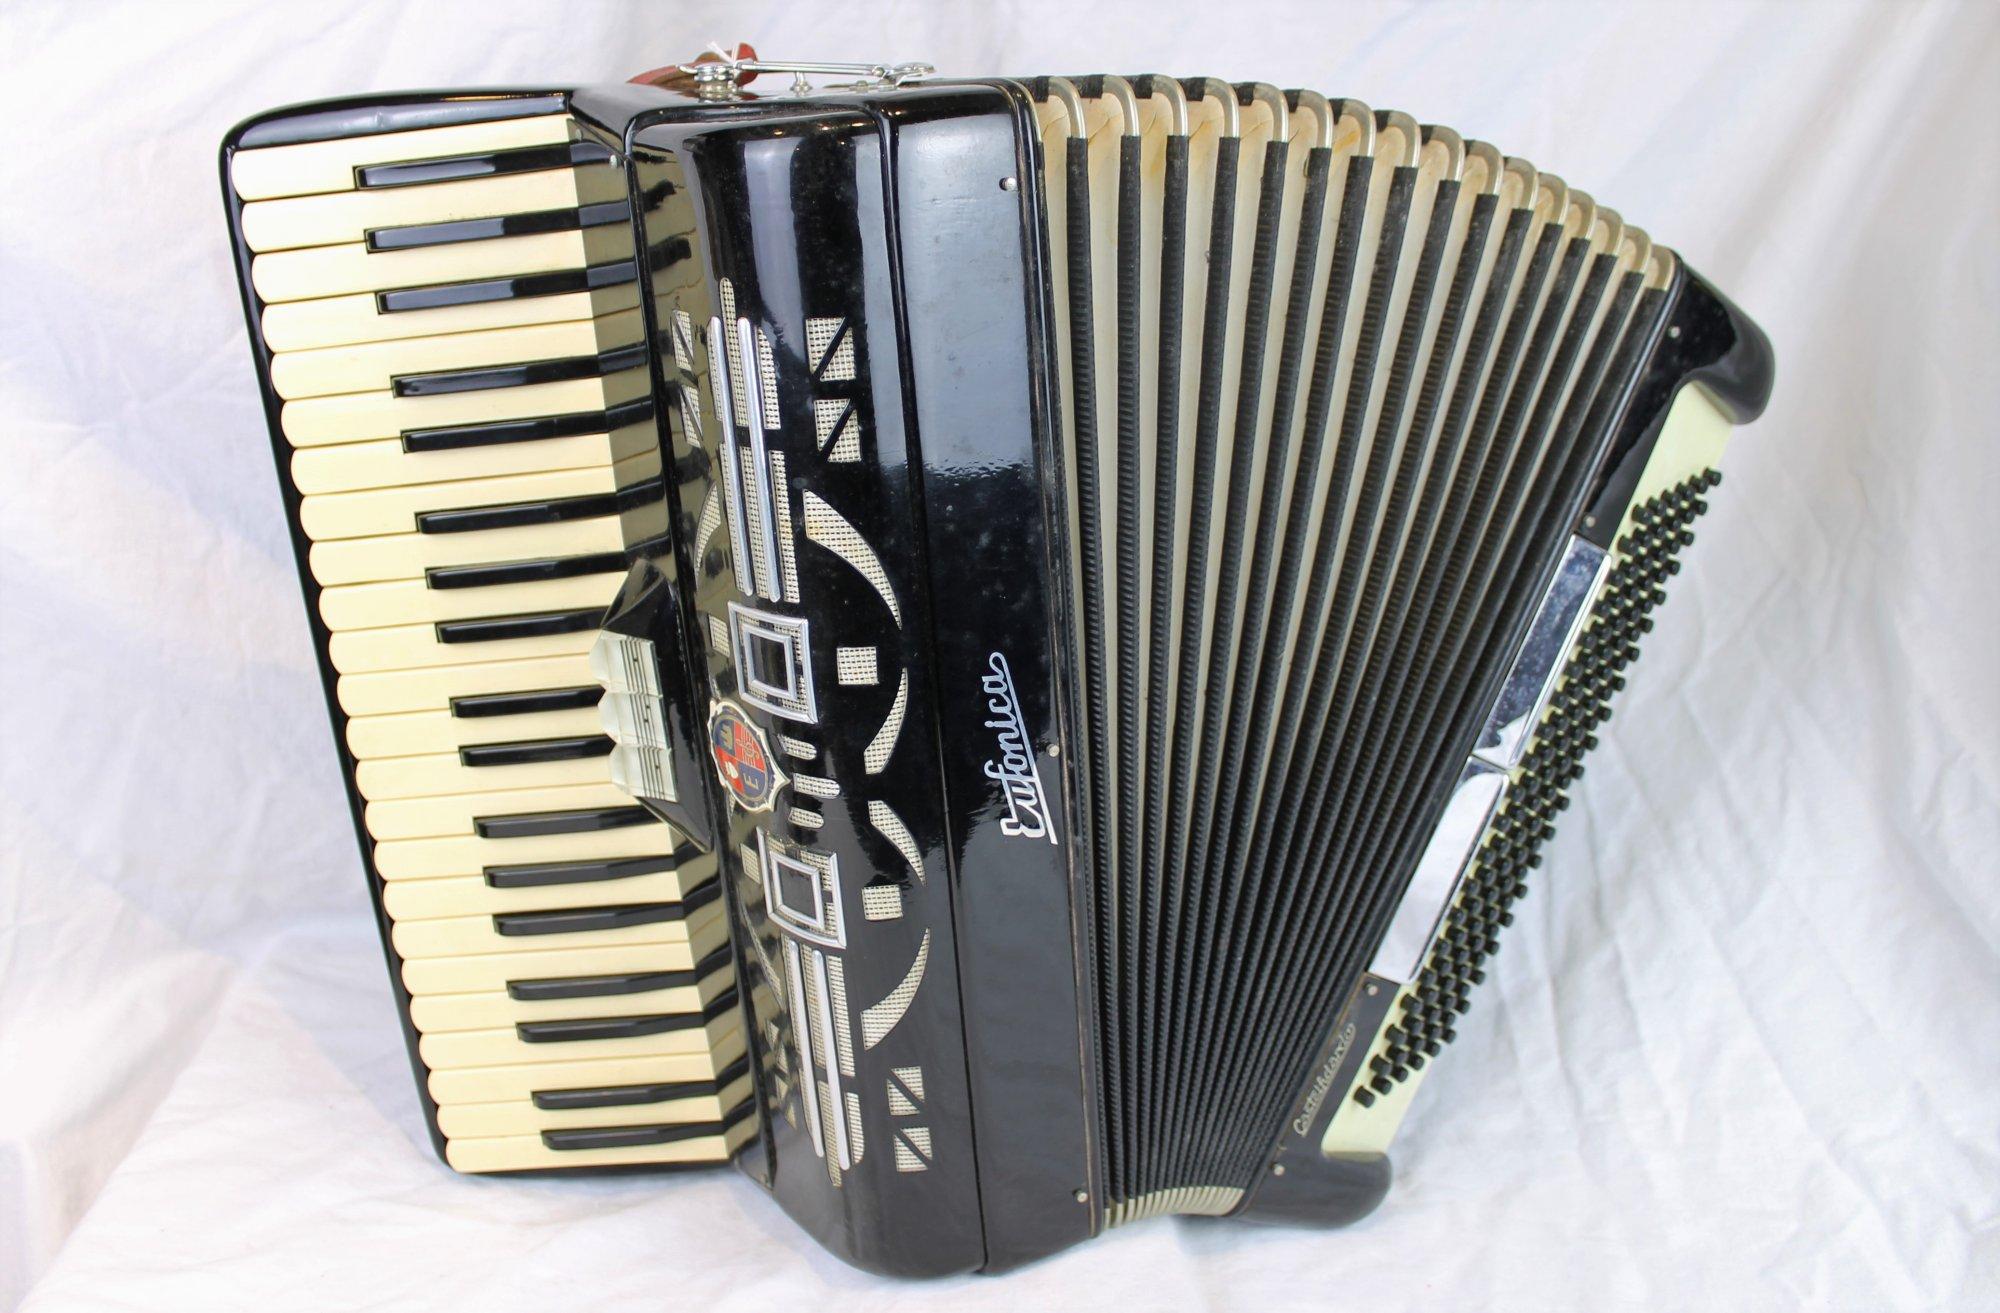 4584 - Black Eufonica Piano Accordion LM 41 120